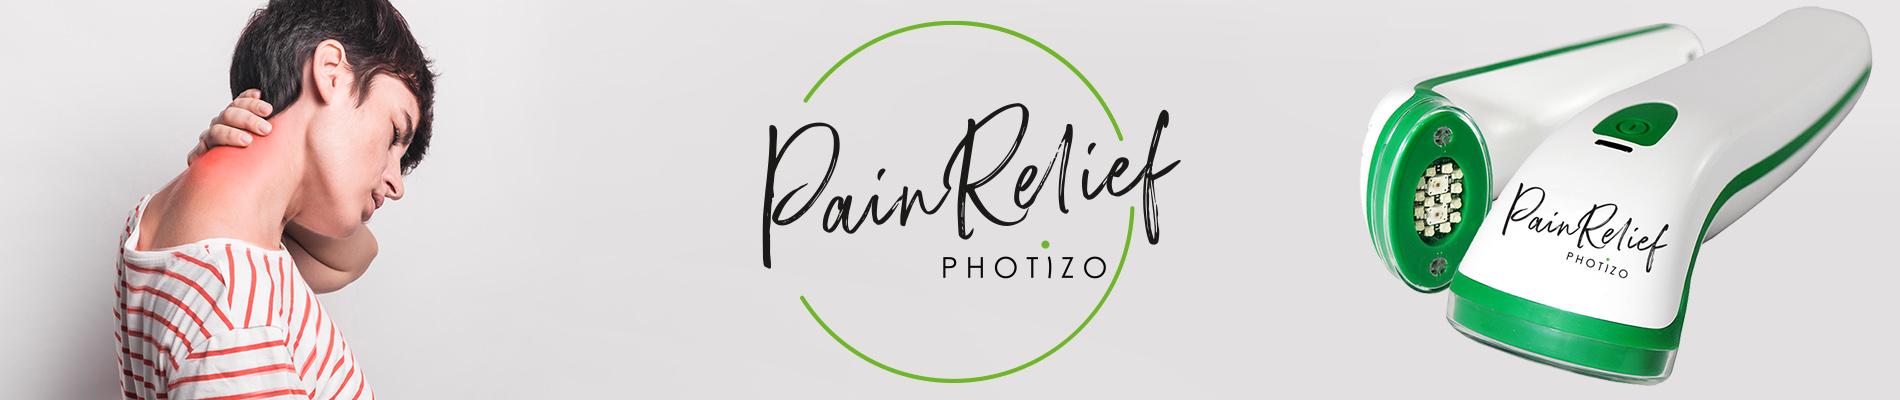 photizo pain relief light therapy